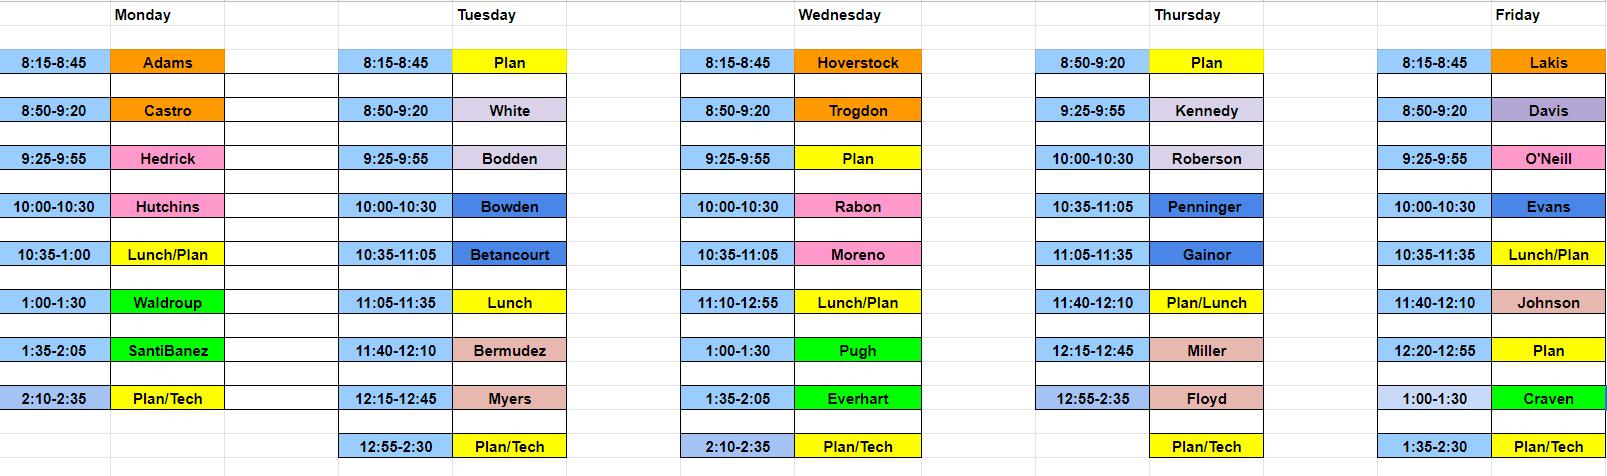 Media Schedule 21-22